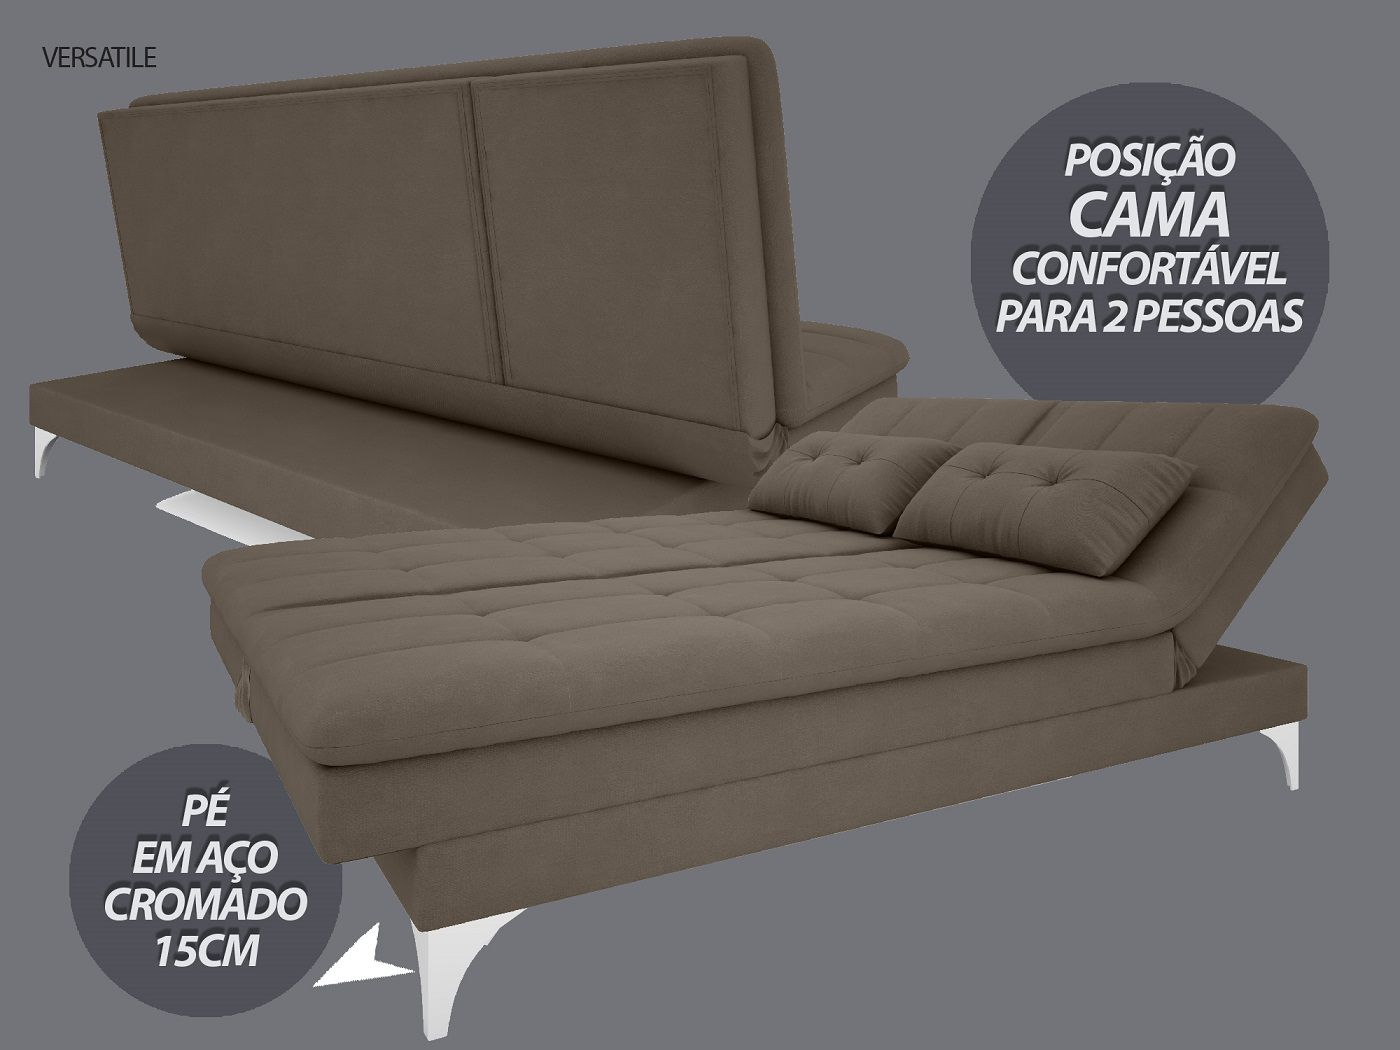 Sofá-Cama Casal New Versatile 1,94m Velosuede Marrom - NETSOFAS